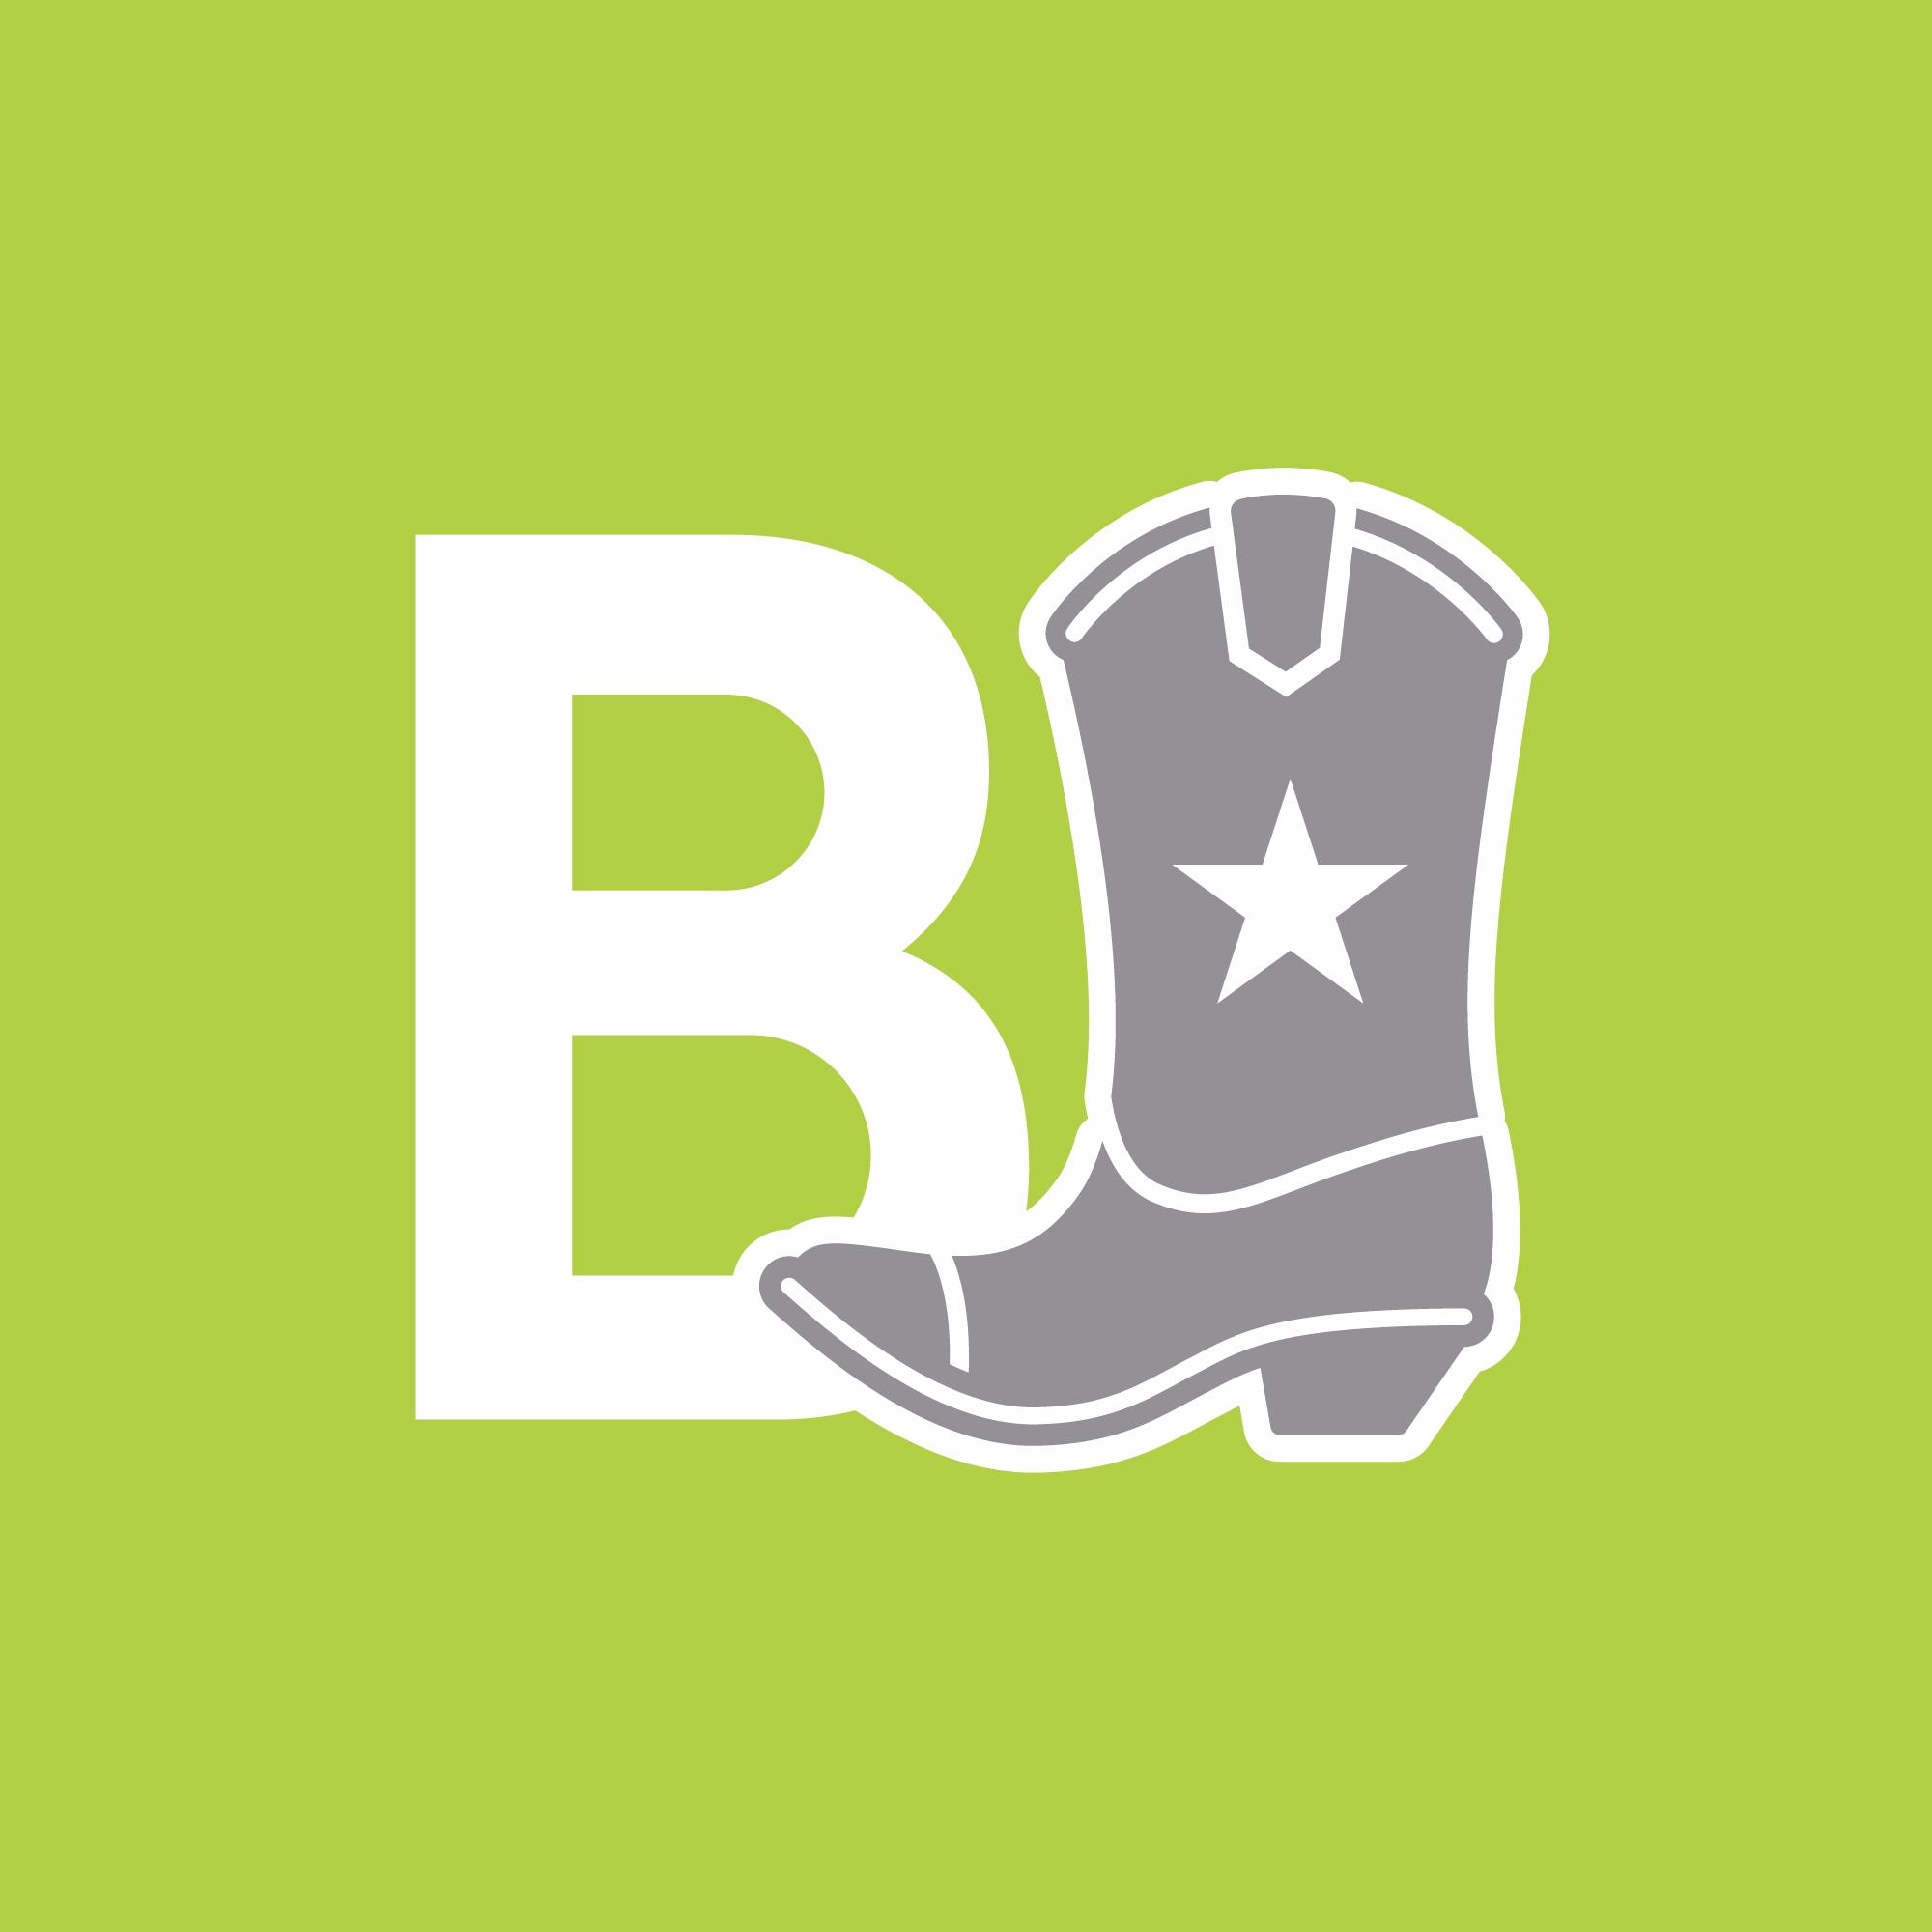 BFA_bandboot_green.jpg